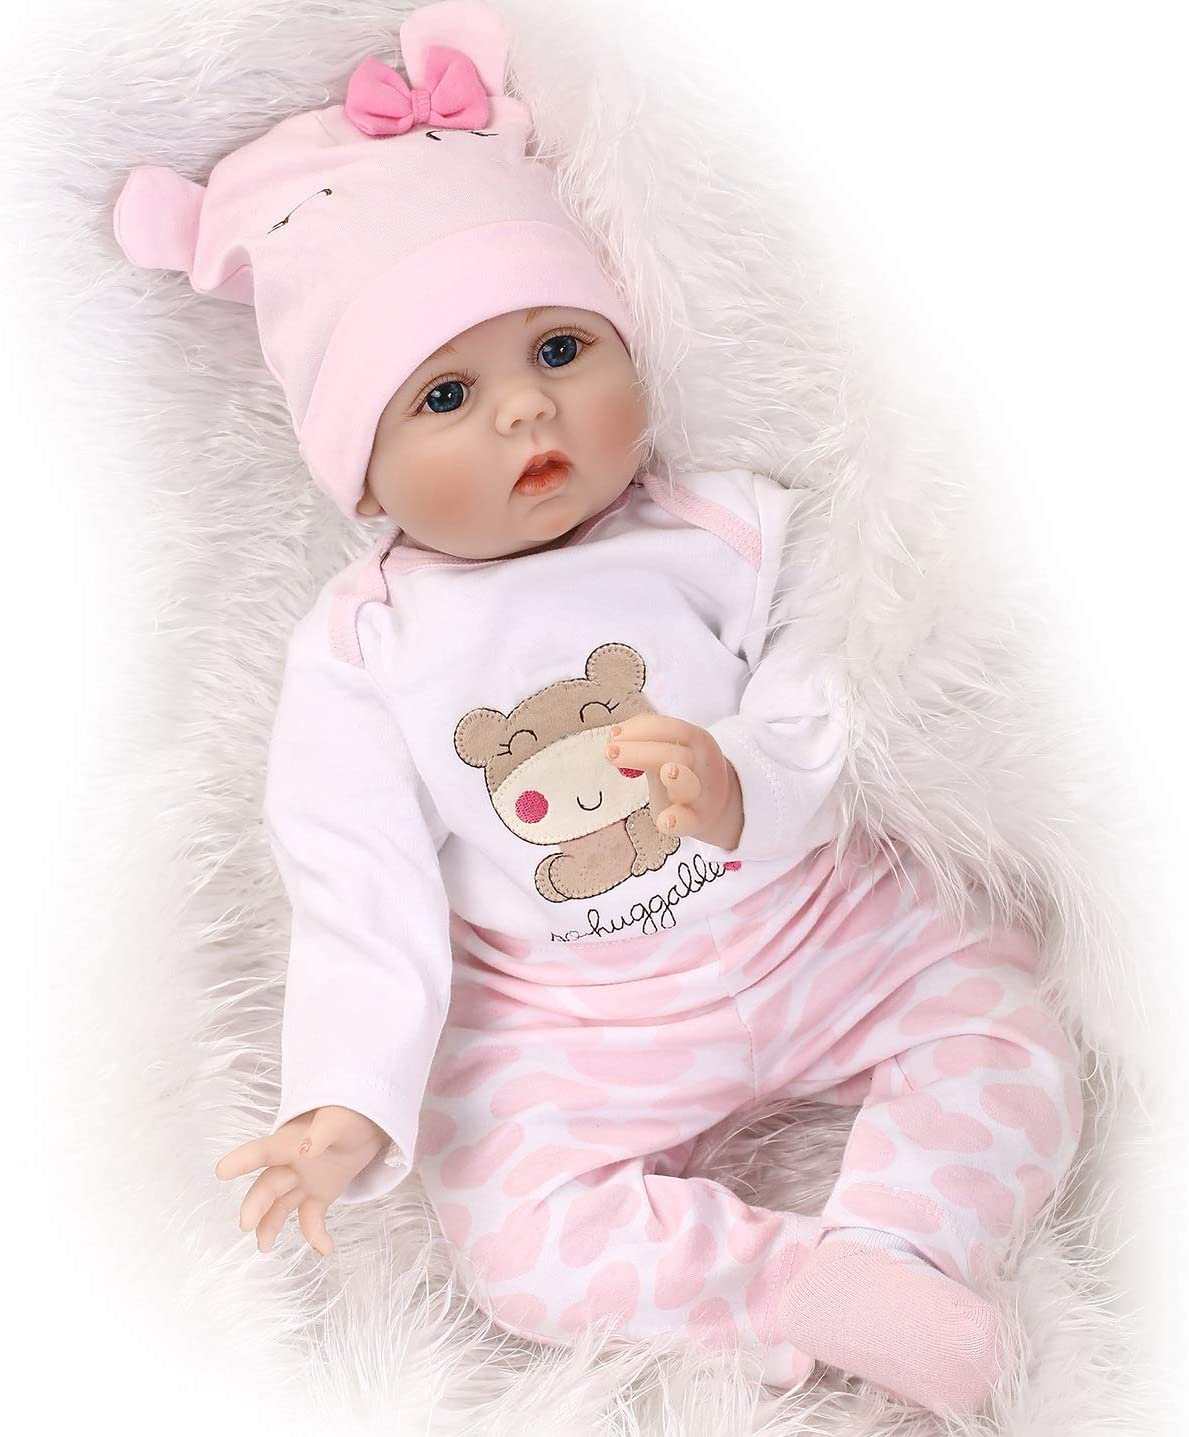 price NPKDOLLs Reborn Baby Dolls Recommendation 22 inches Vi Simulation Soft Silicone